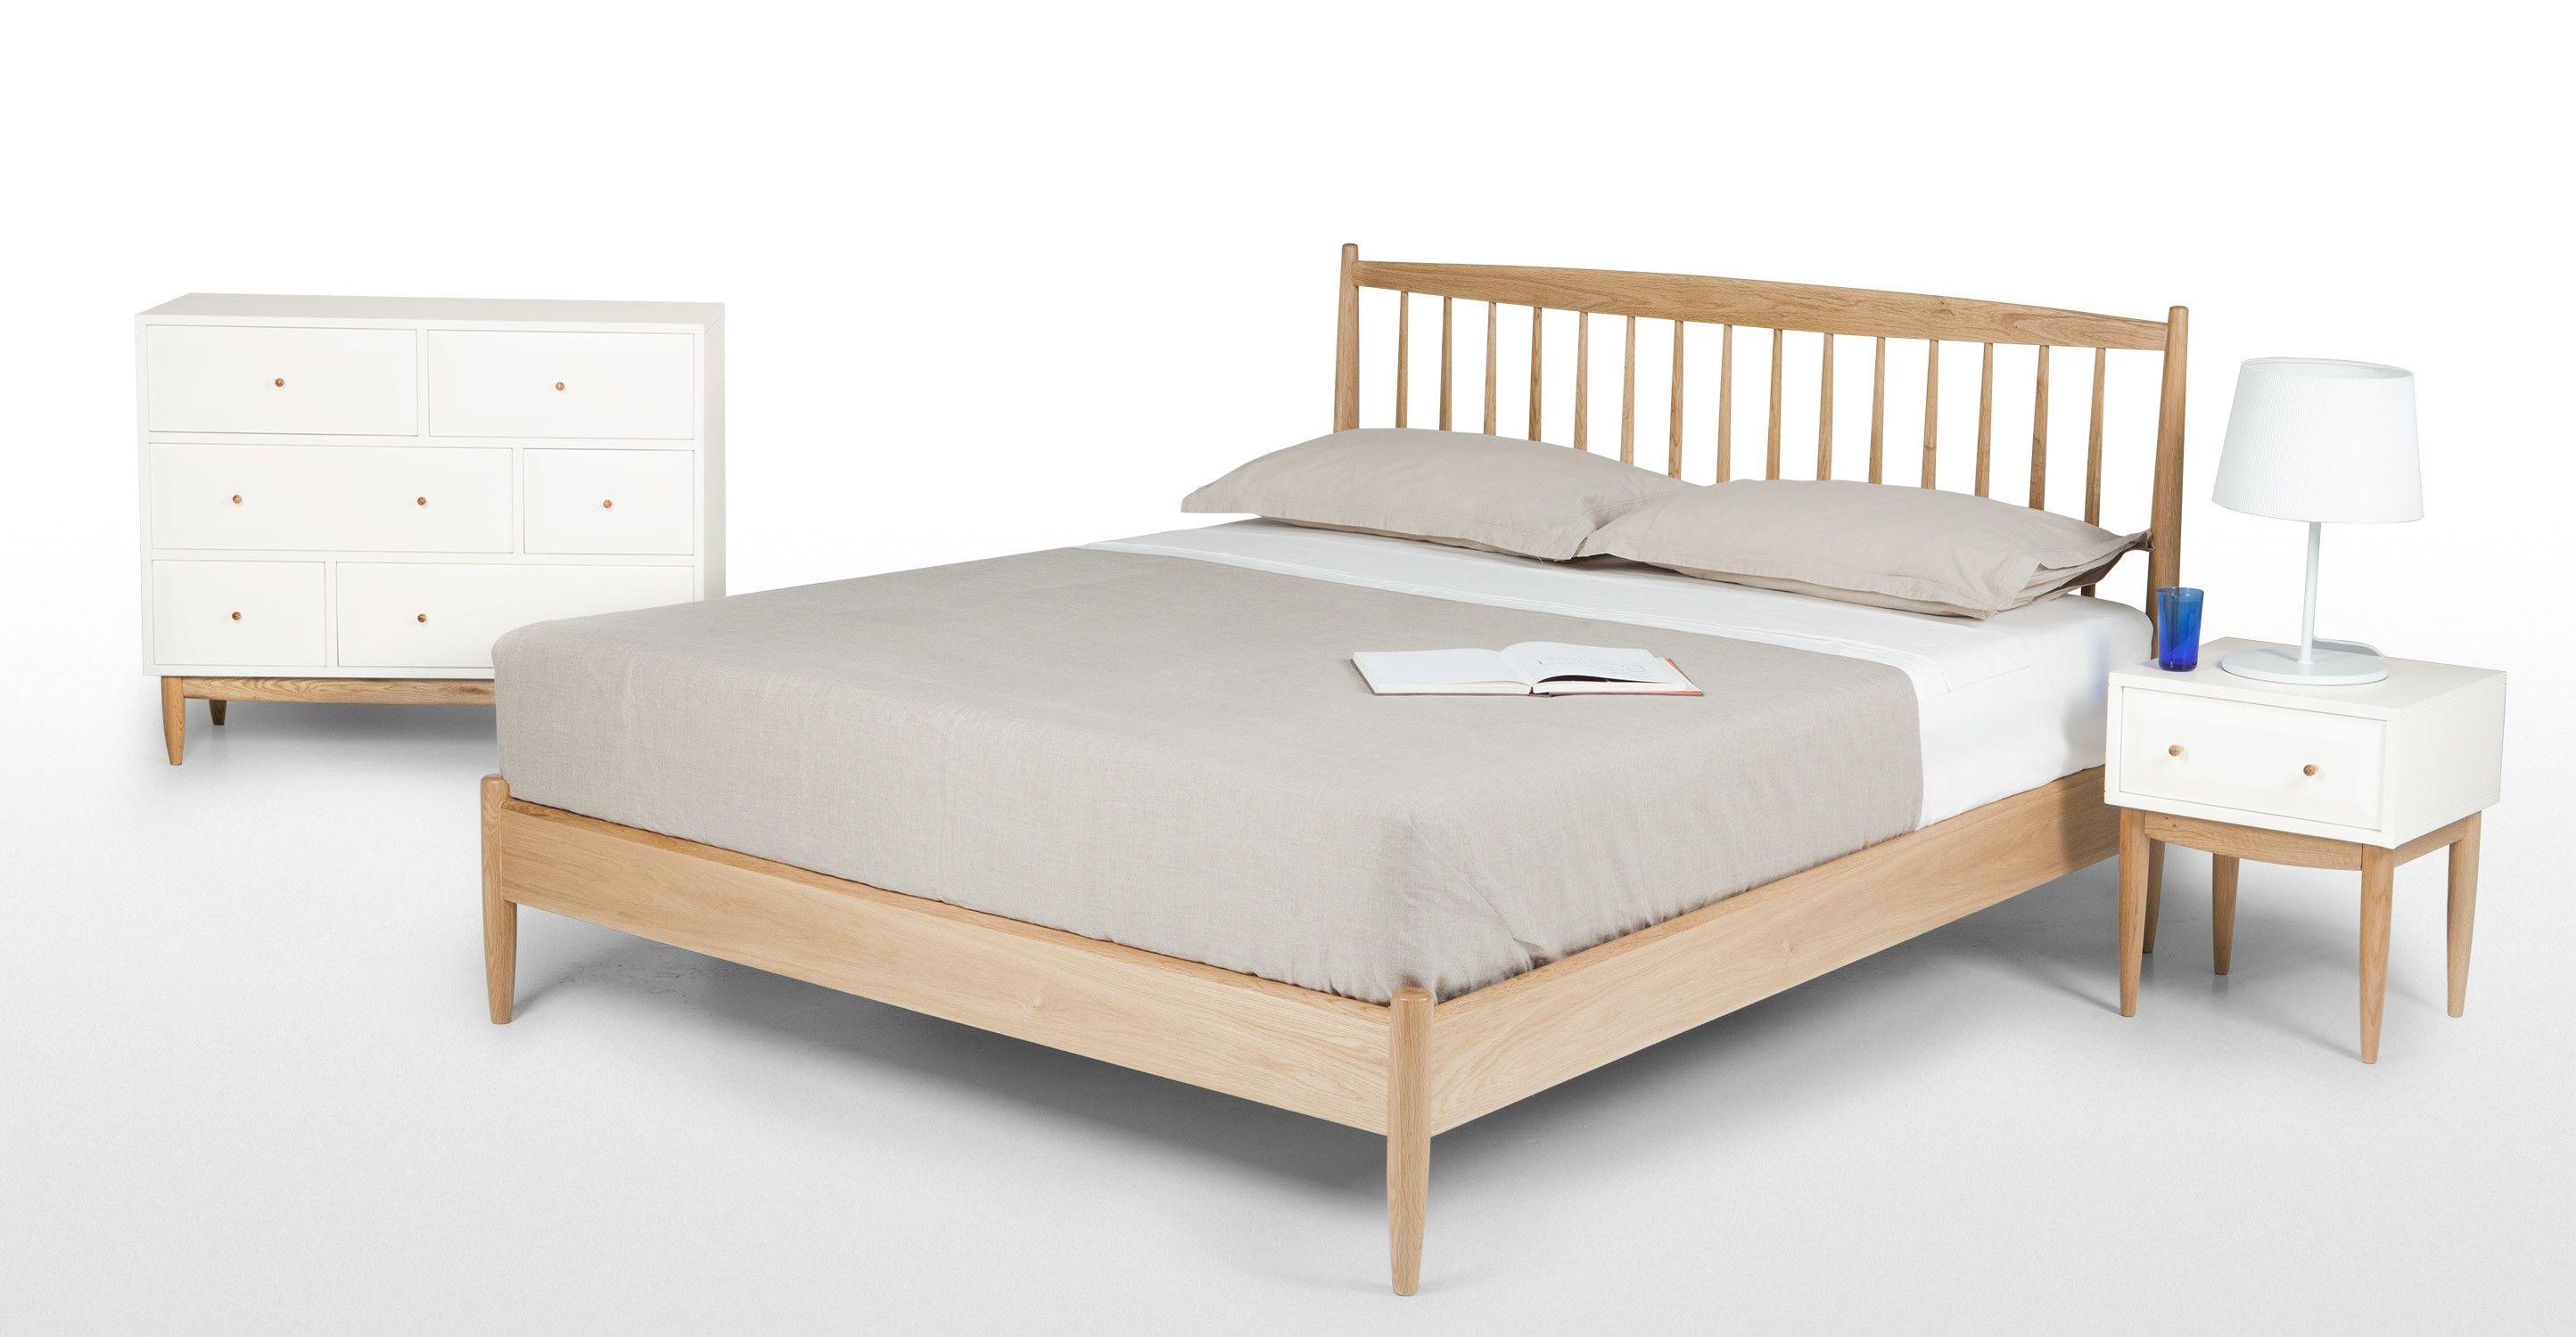 Willow, lit kingsize (160 x 200), chêne Double beds